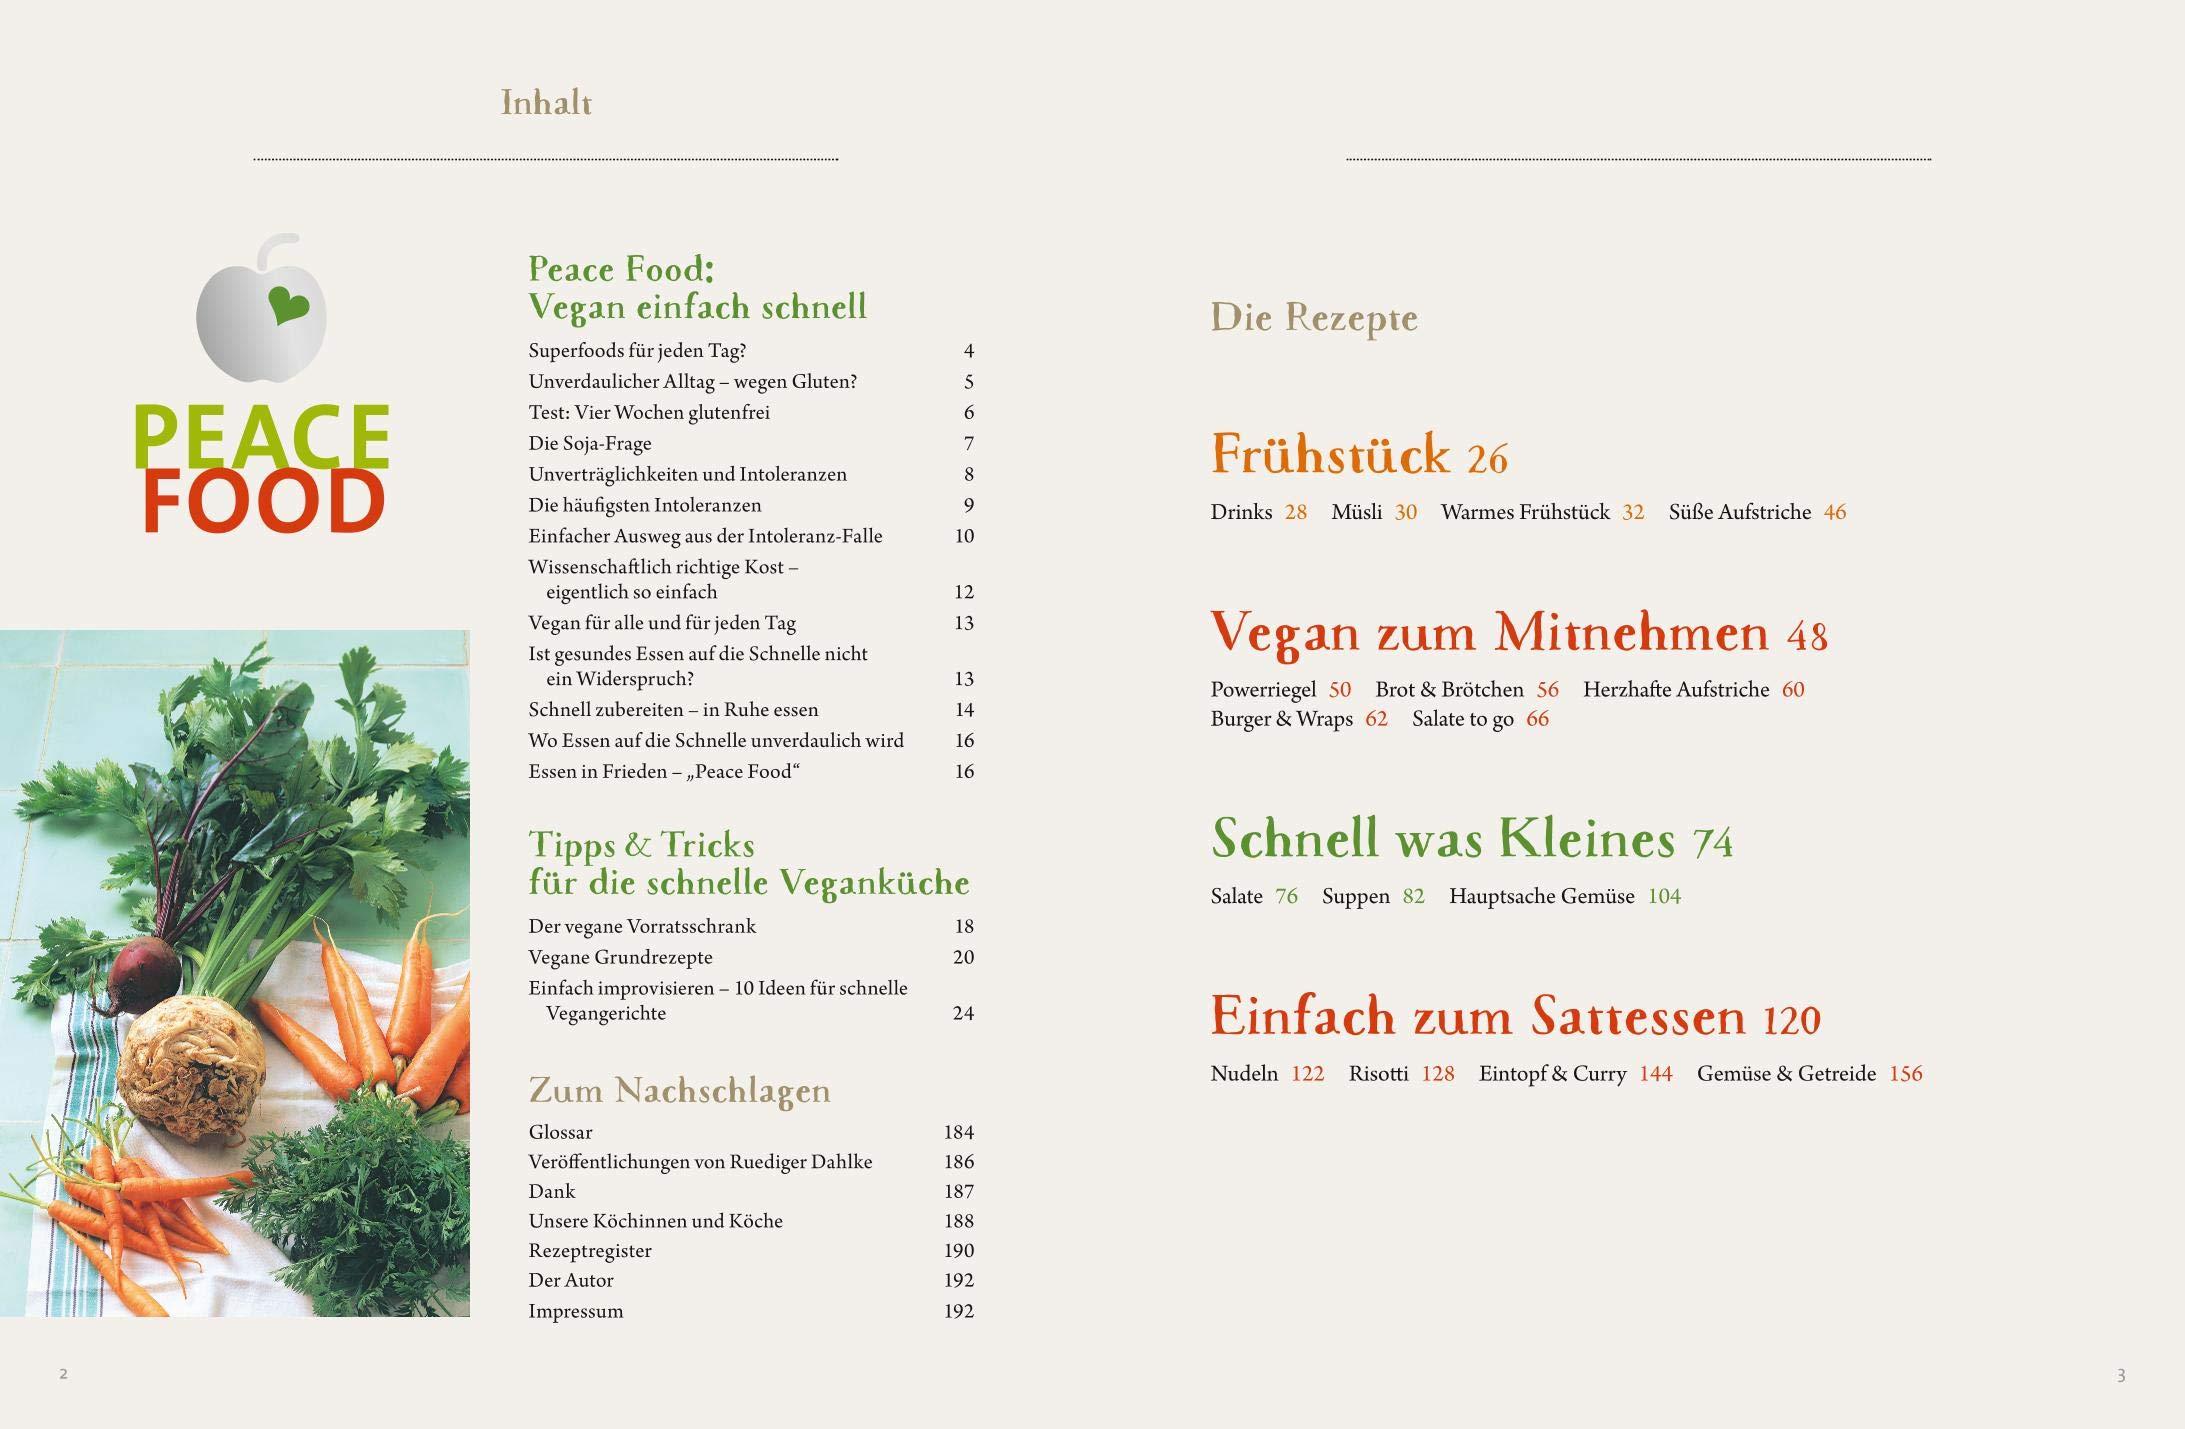 Peace Food - Vegan einfach schnell: Dahlke, Ruediger